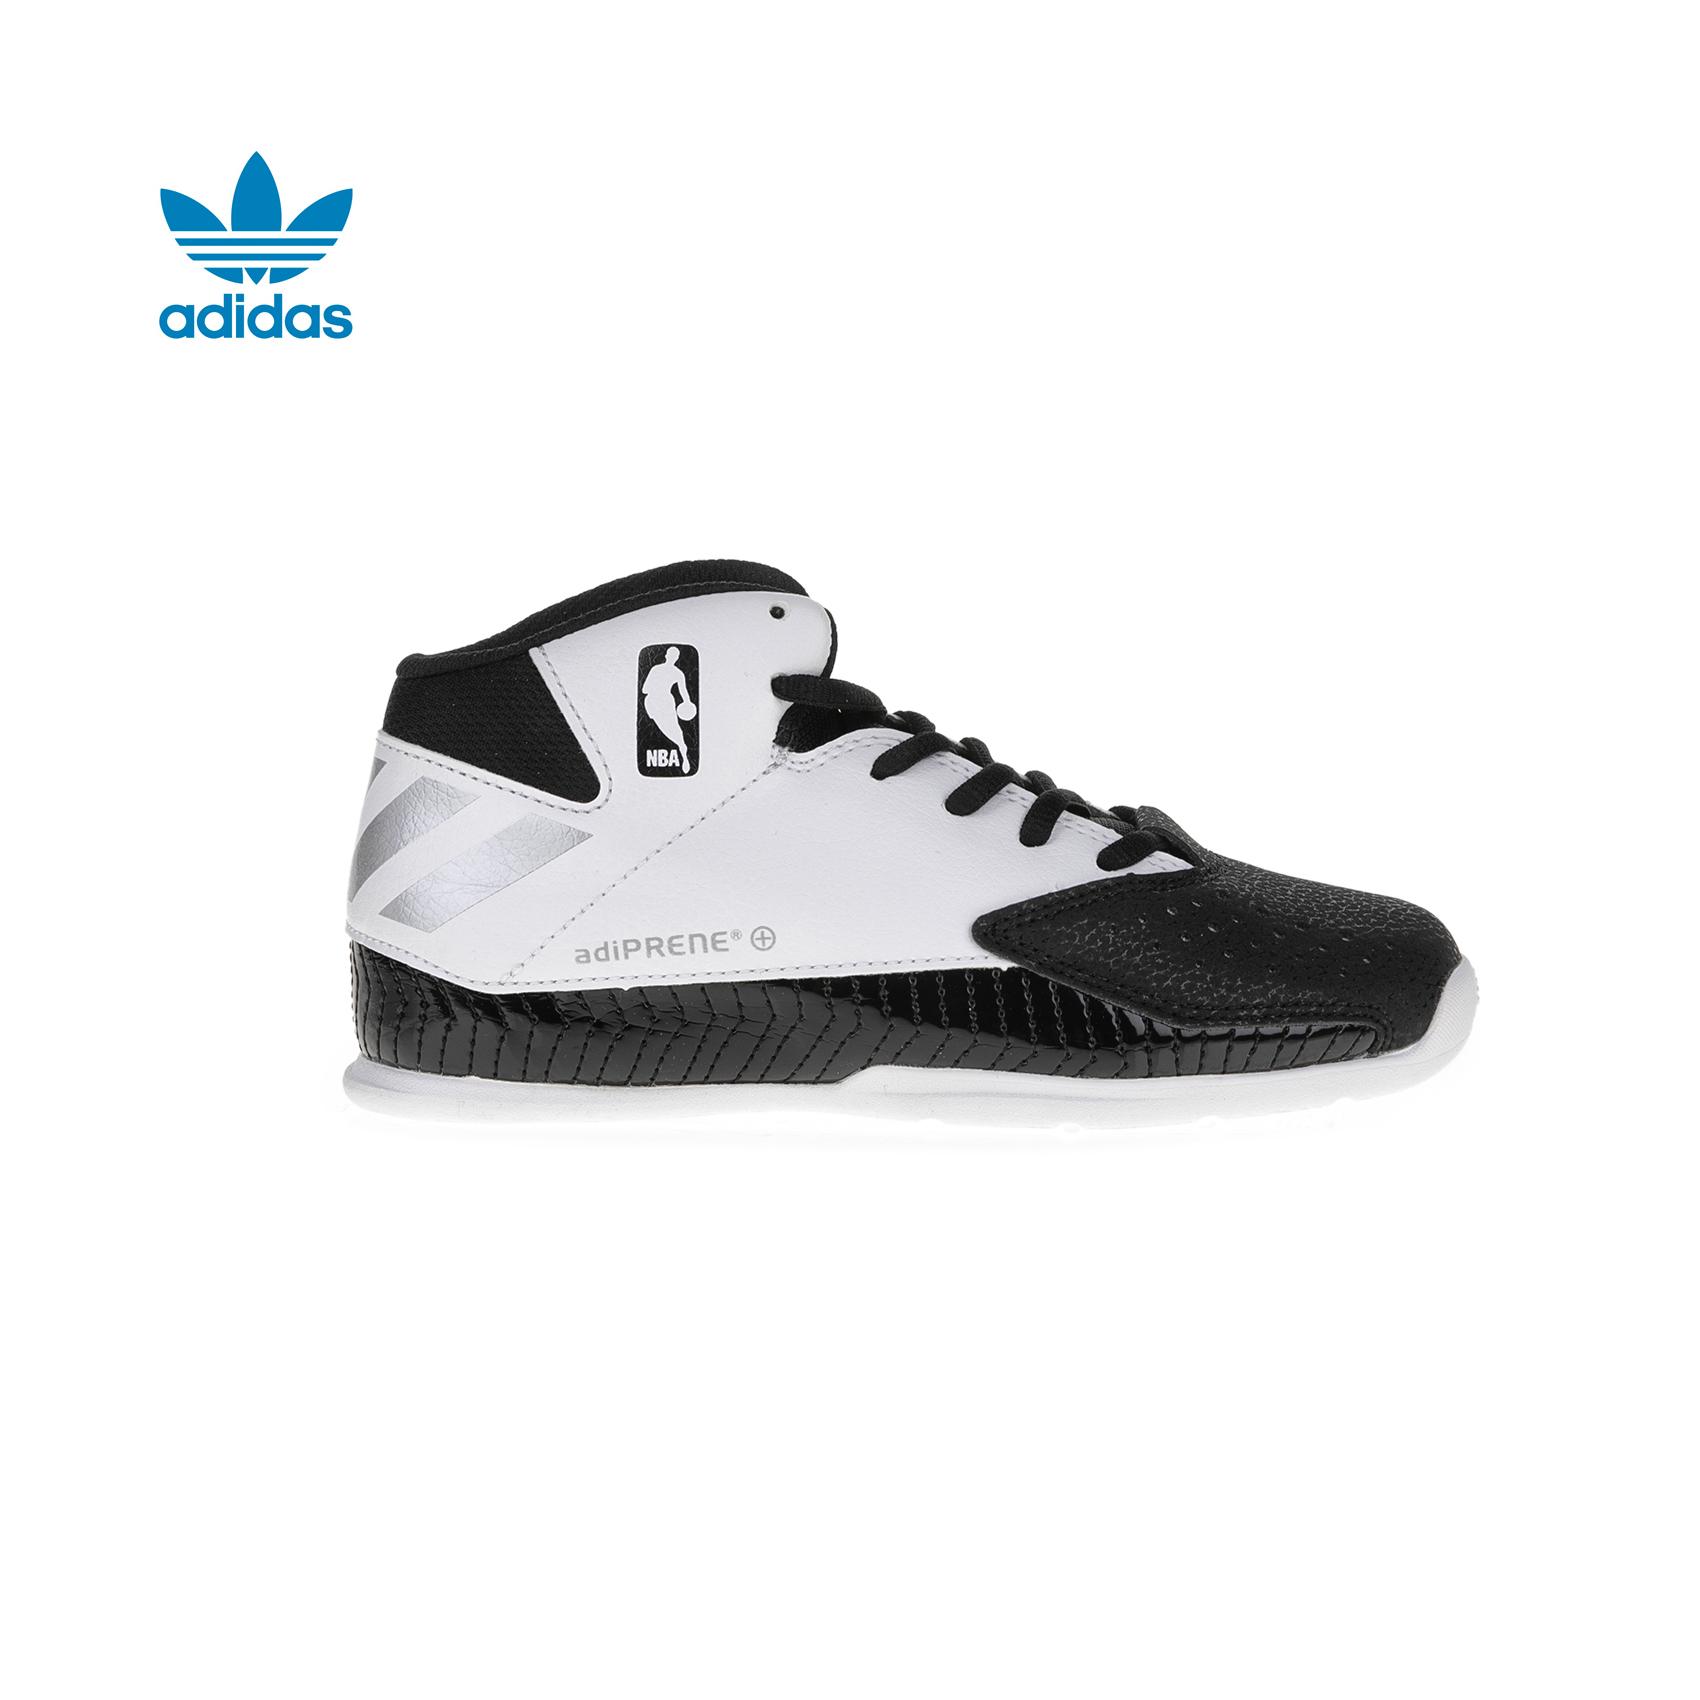 adidas Originals – Παιδικά παπούτσια adidas Nxt Lvl Spd V NBA λευκά-μαύρα